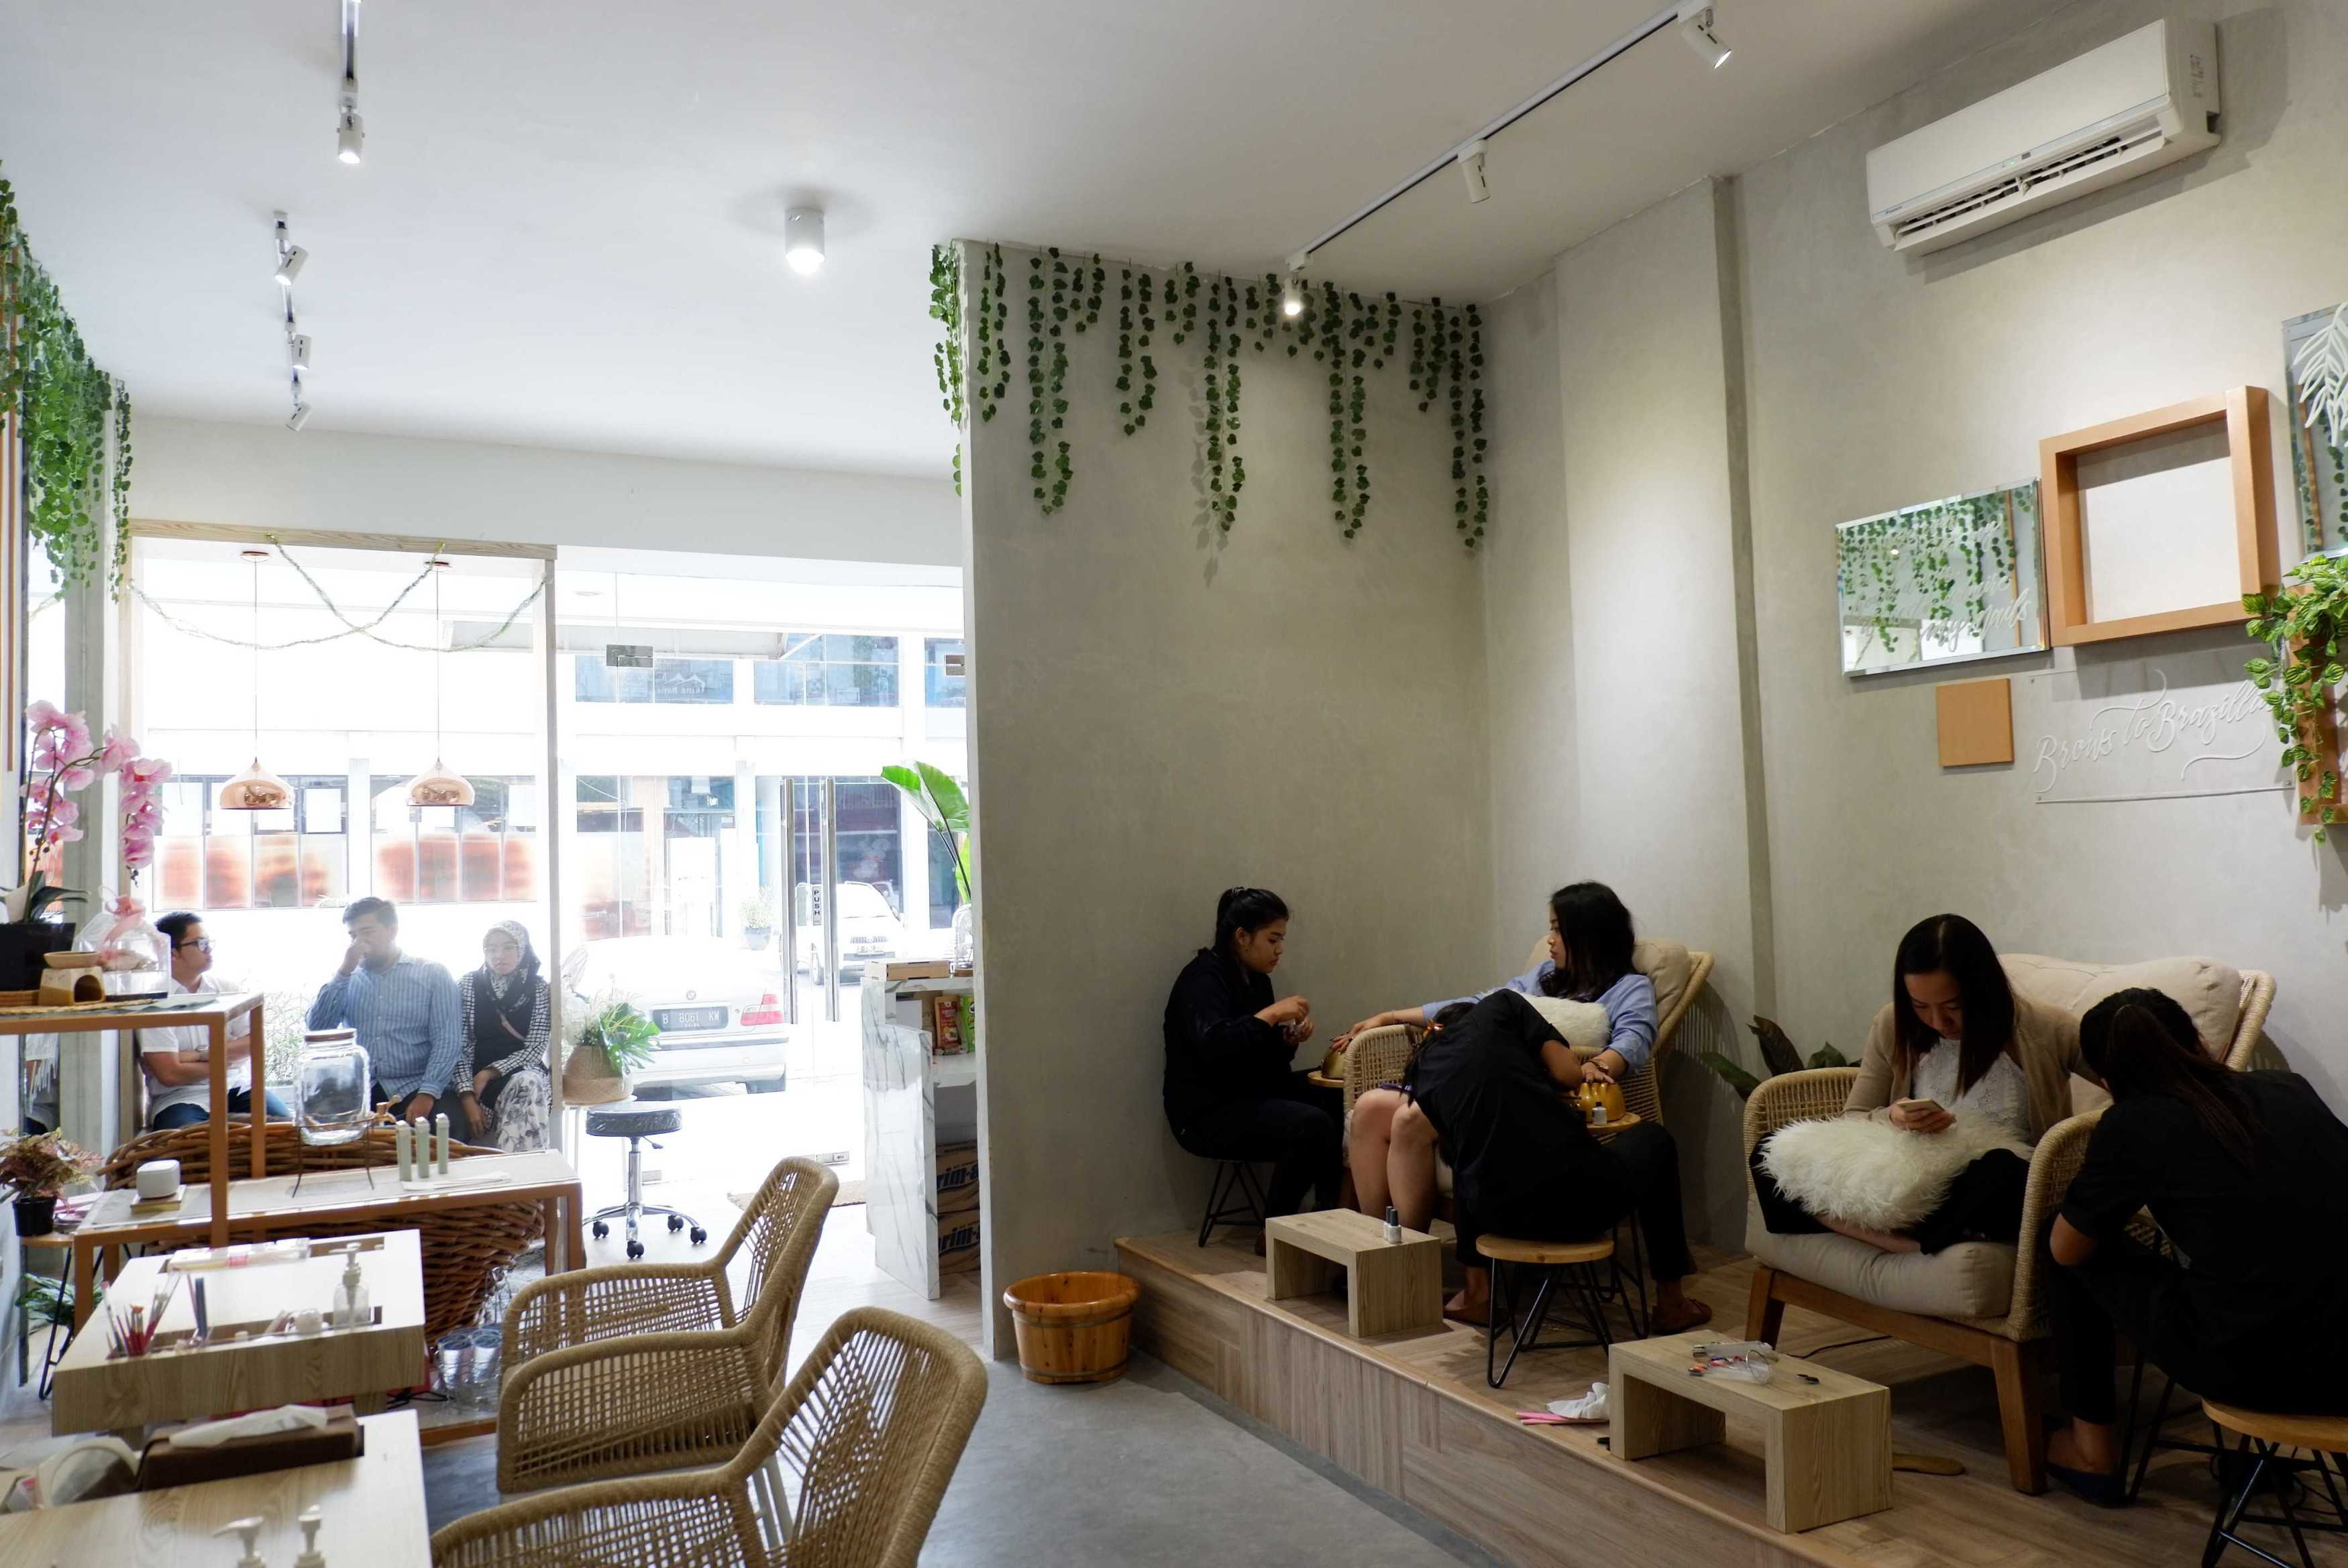 Studio Kuskus Katanya Beauty Studio Citra 6 Ruko Citra Garden 6 J5B No. 7, Tegal Alur, Kalideres, Rt.2/rw.5, Tegal Alur, Kalideres, West Jakarta City, Jakarta 11820, Indonesia Ruko Citra Garden 6 J5B No. 7, Tegal Alur, Kalideres, Rt.2/rw.5, Tegal Alur, Kalideres, West Jakarta City, Jakarta 11820, Indonesia Studio-Kuskus-Katanya-Beauty-Studio-Citra-6   70460